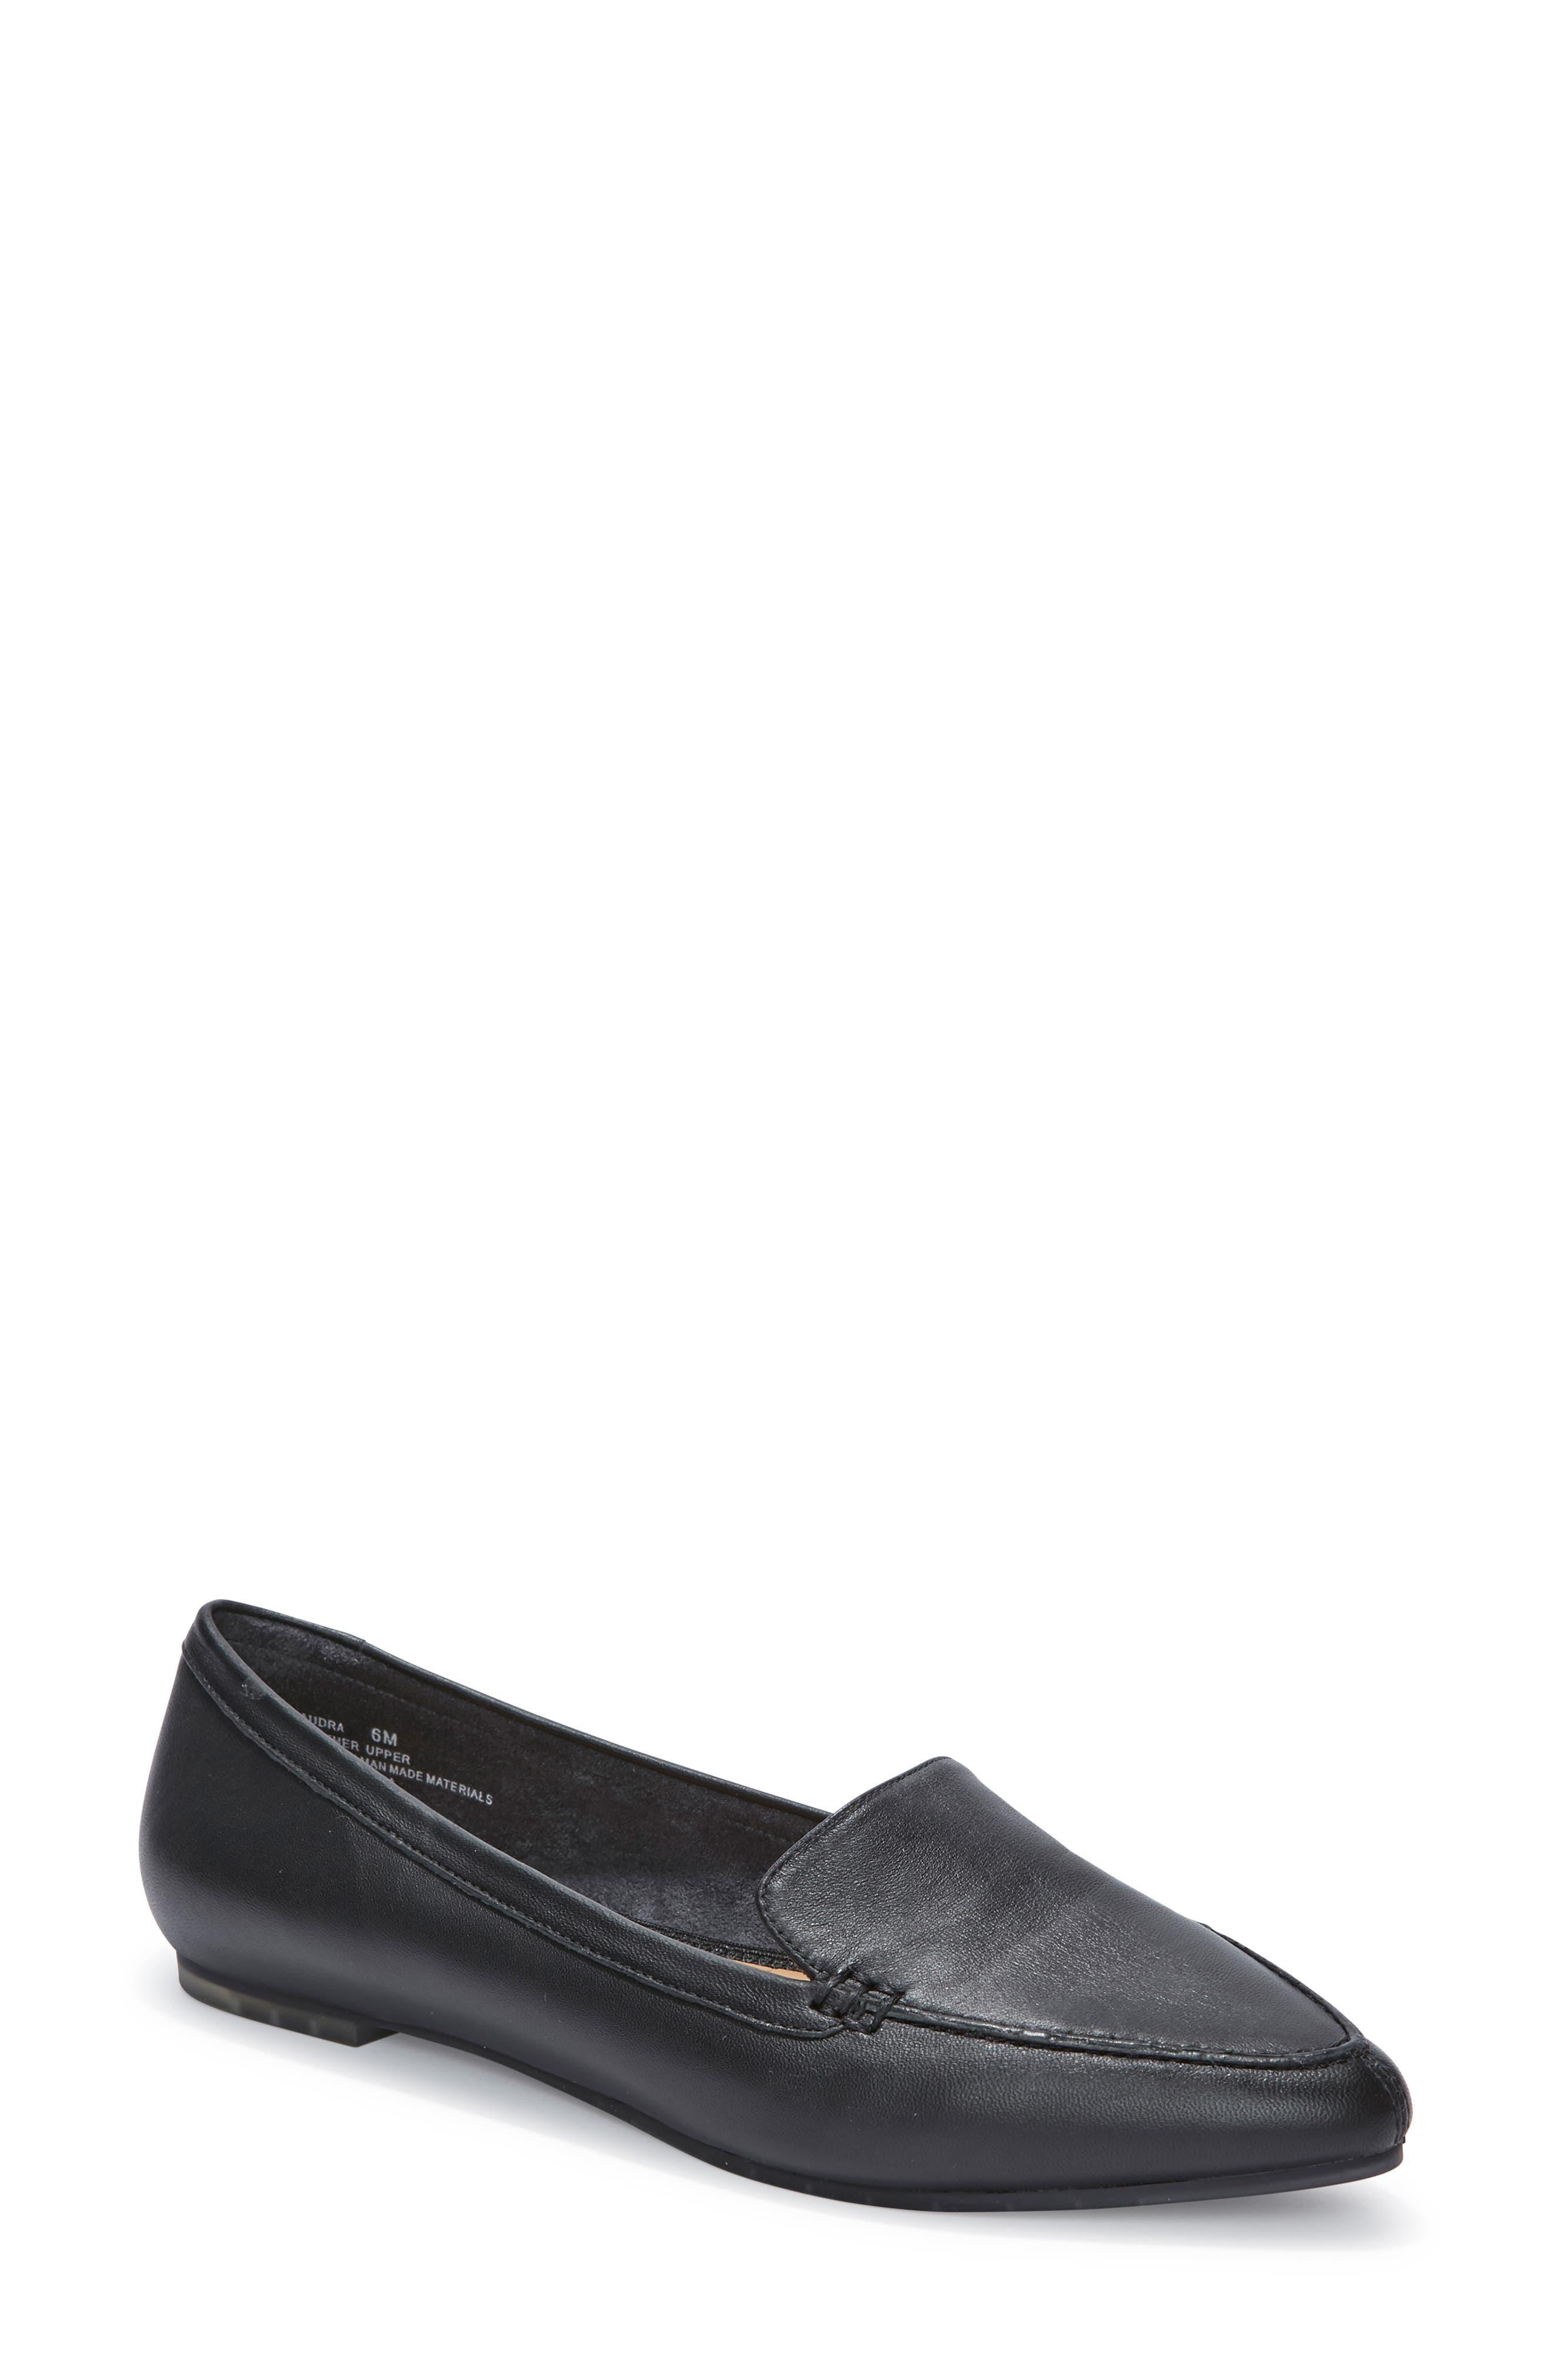 Audra Loafer Flat, Main, color, BLACK/ BLACK LEATHER